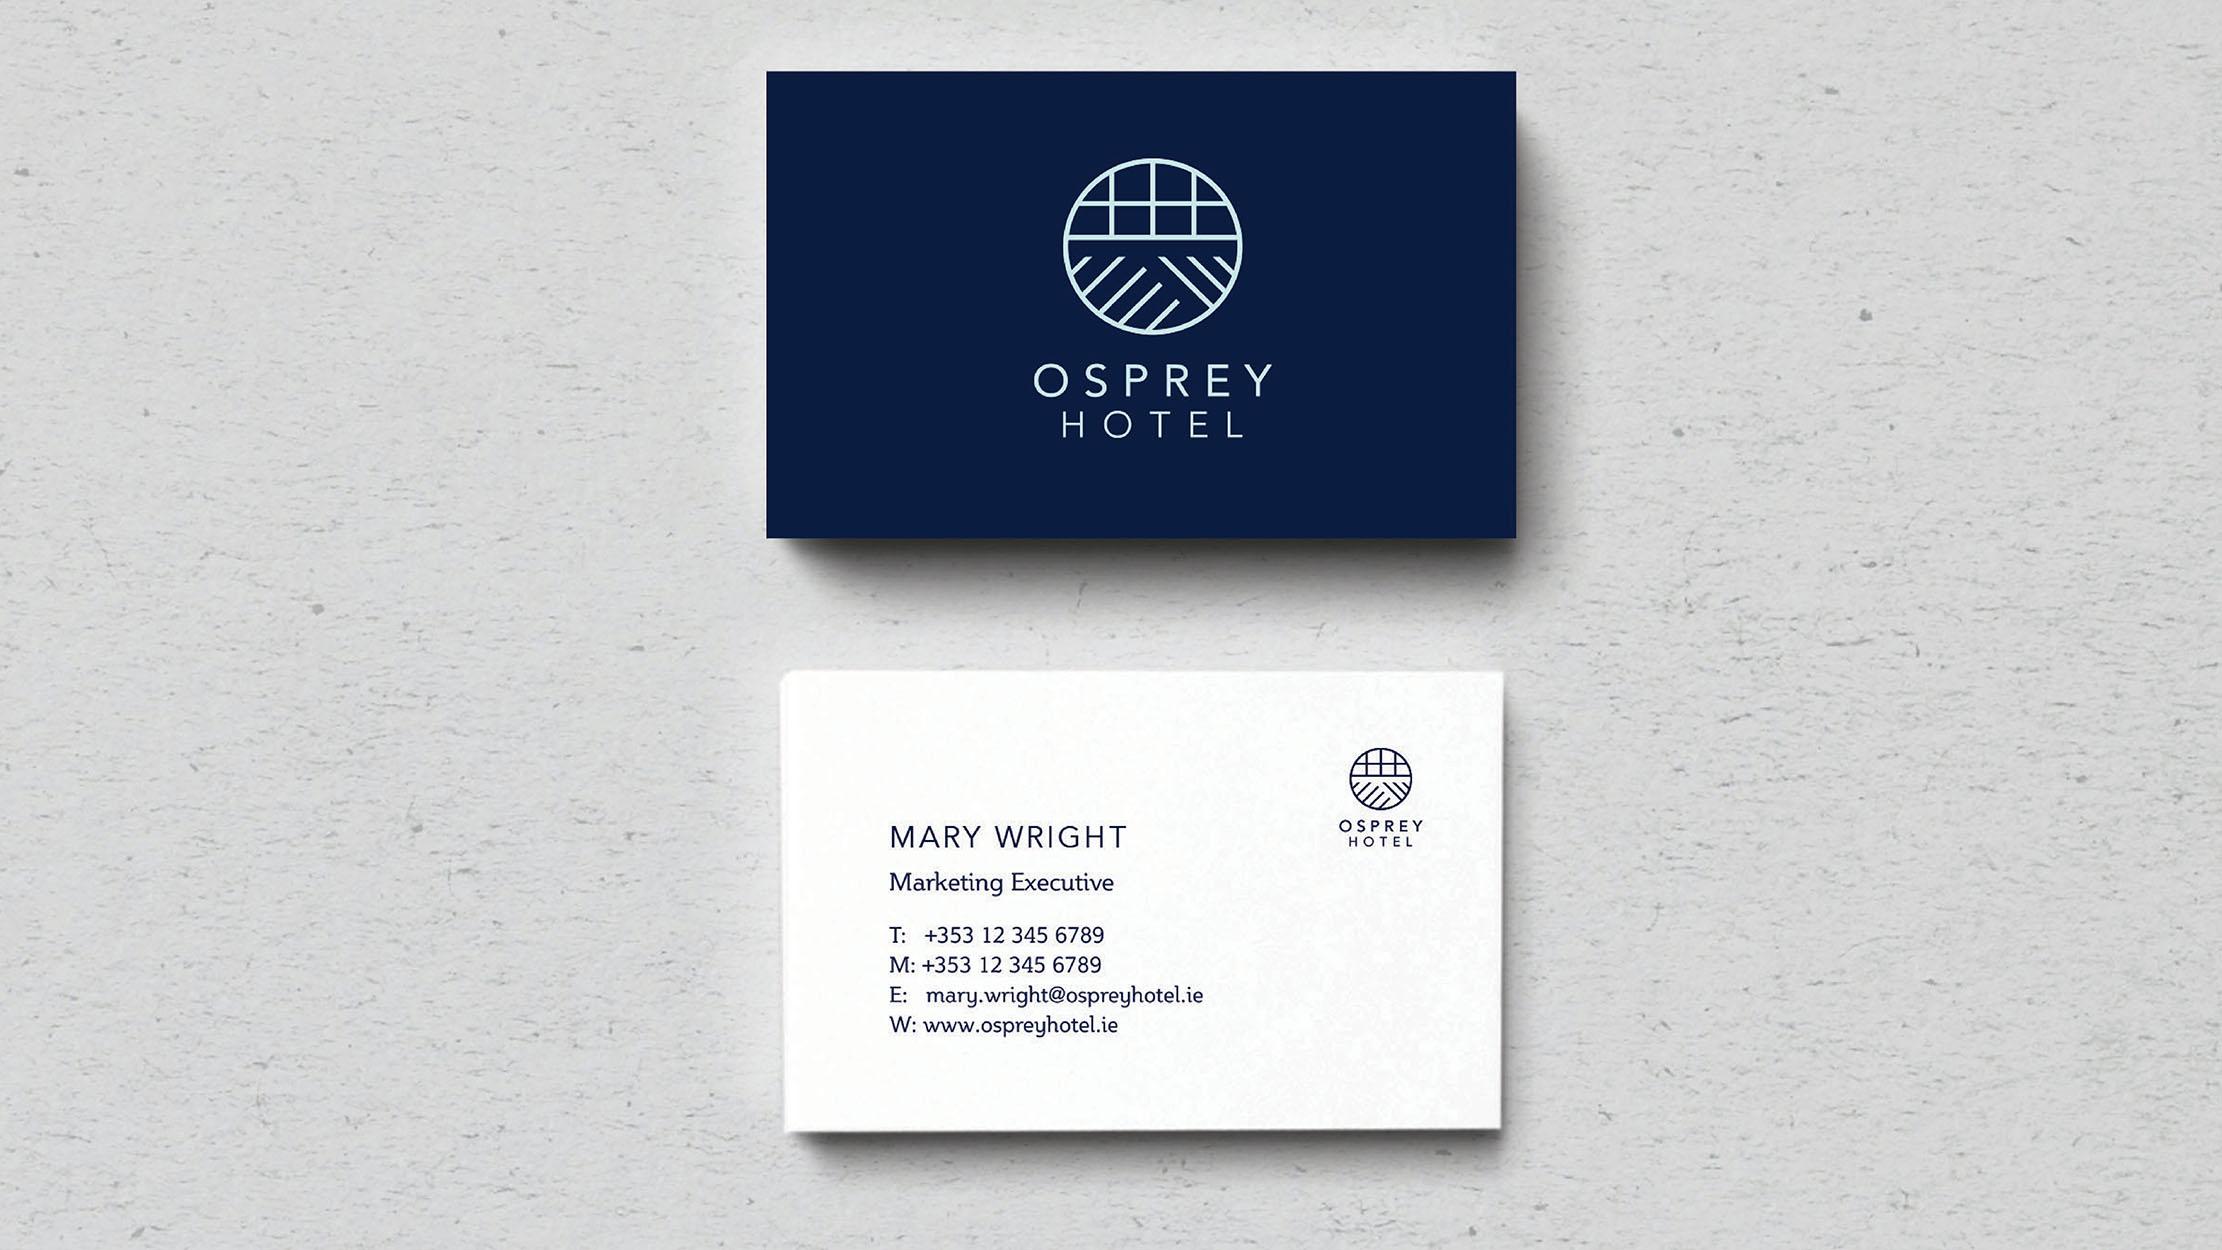 Osprey Hotel -3